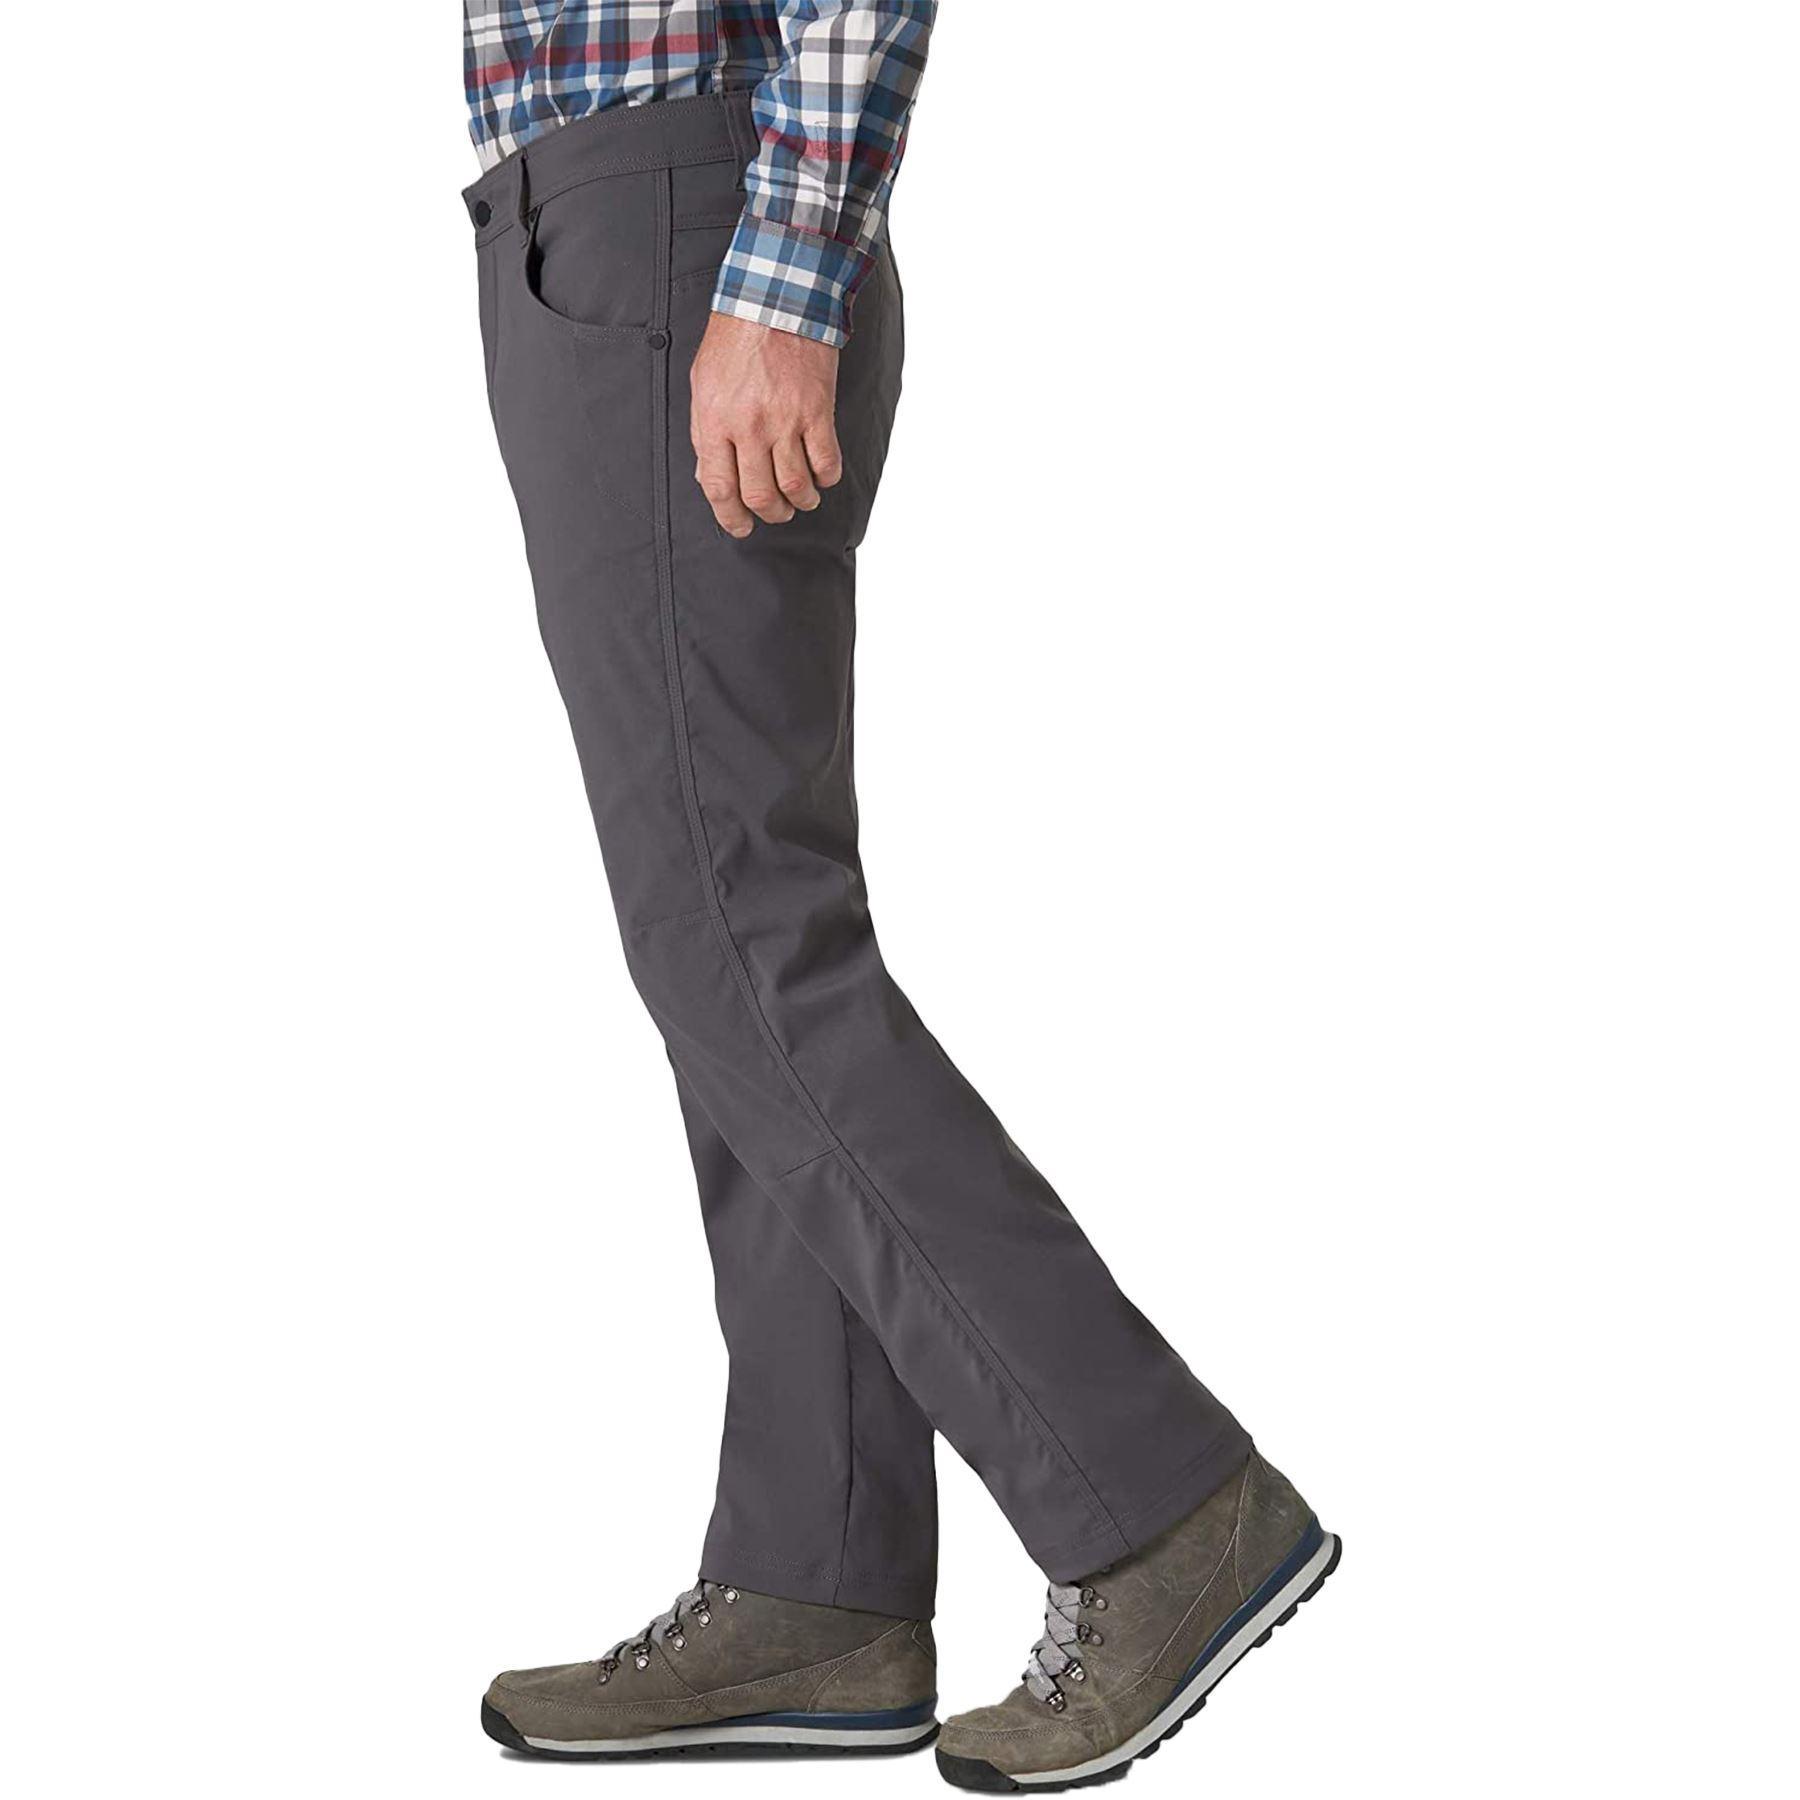 WRANGLER Mens Thermal Fleece Lined Cargo Combat Water Repellant Trousers Pants